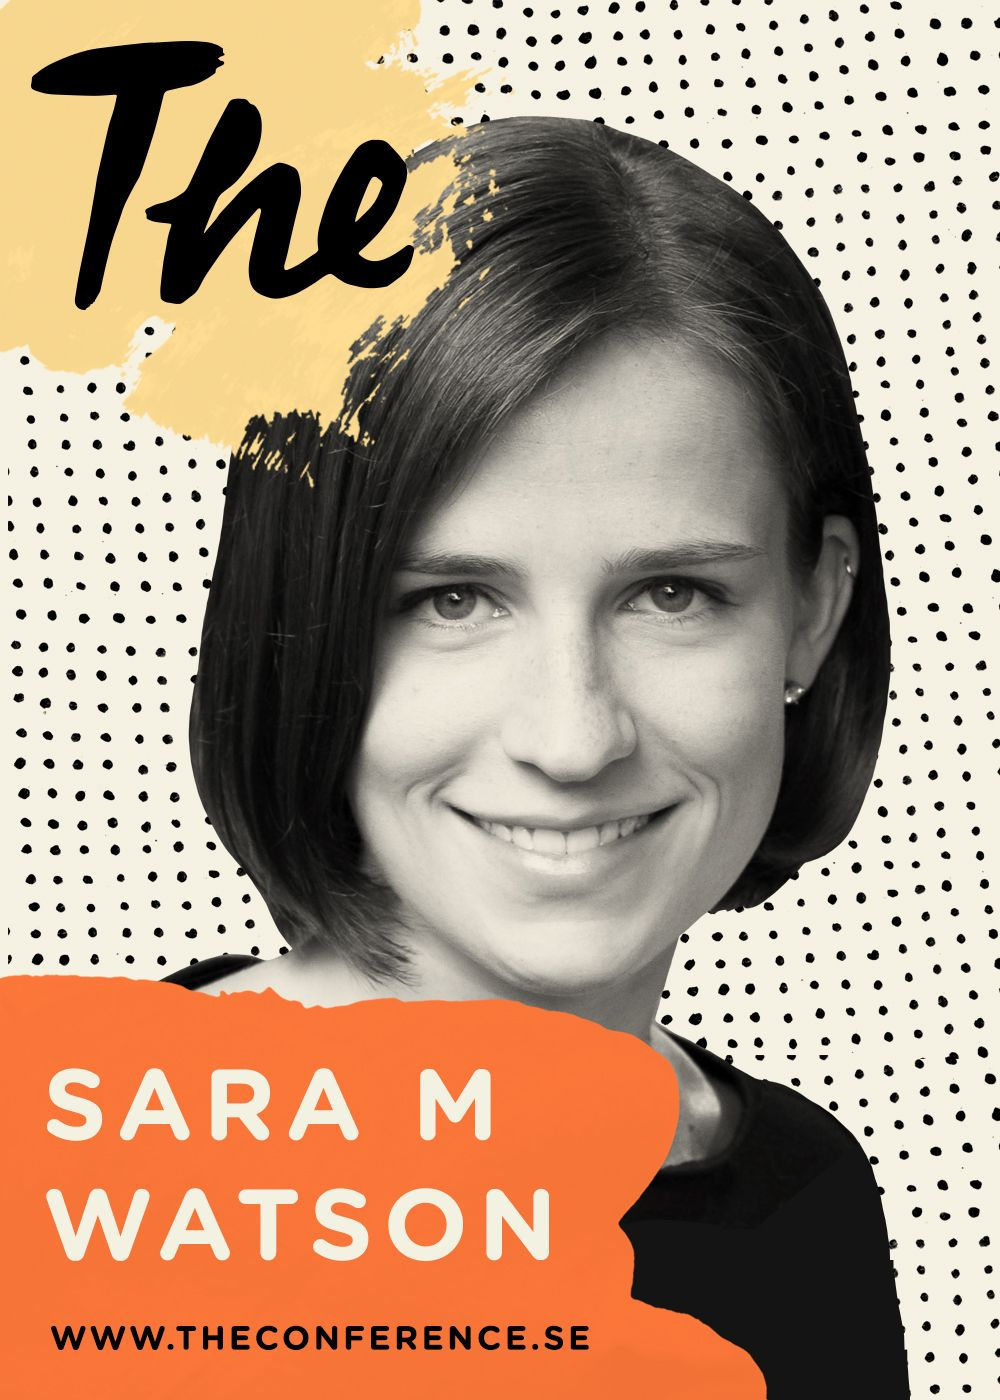 Sara M Watson, Technology critic and Berkman Fellow, Berkman Center for  Internet and Society at Harvard University. - Design: Hvass Hannibal